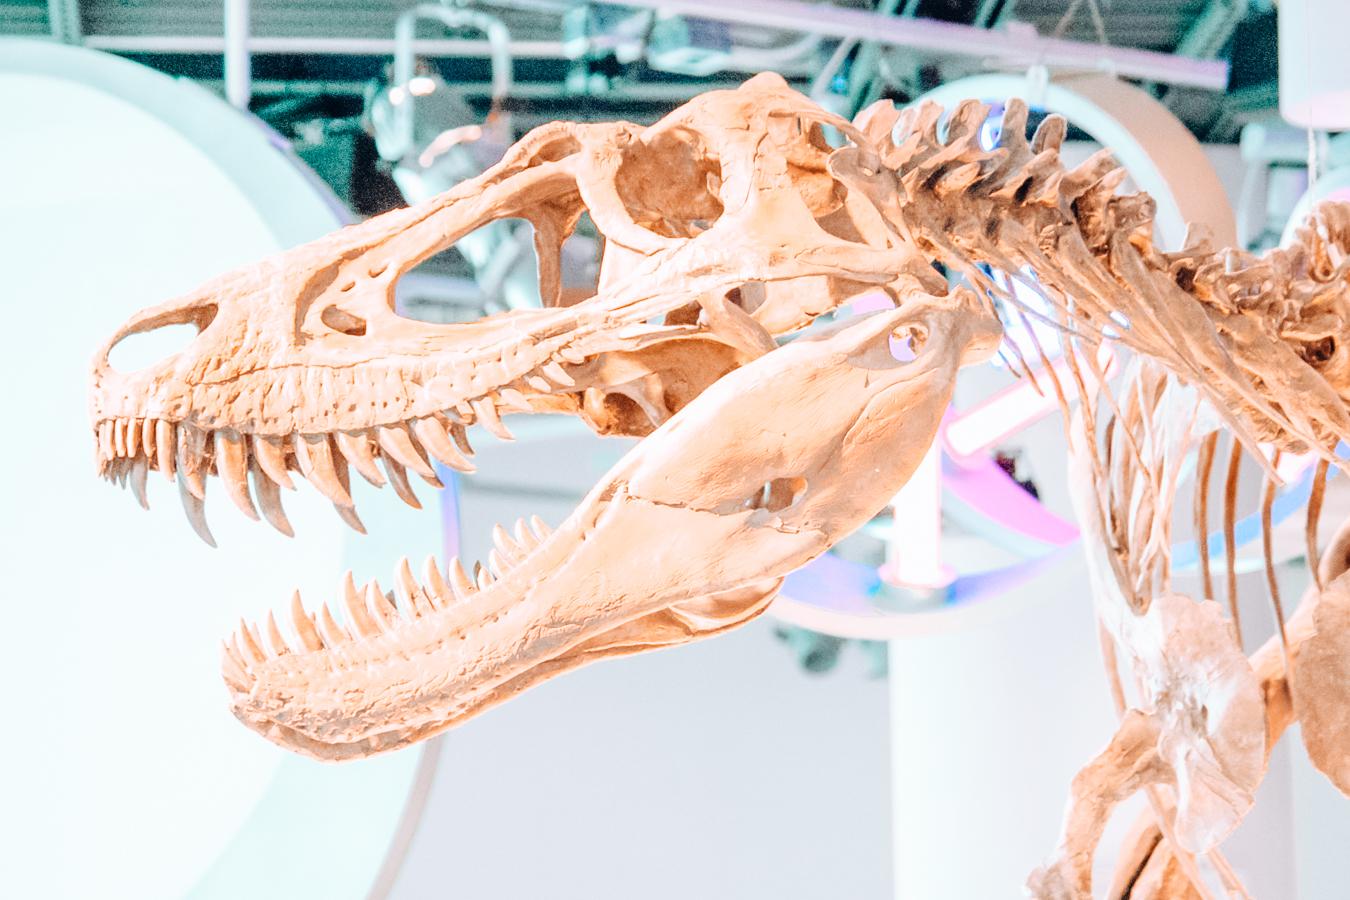 Dinosaur skeleton at the North Carolina Museum of Natural Sciences